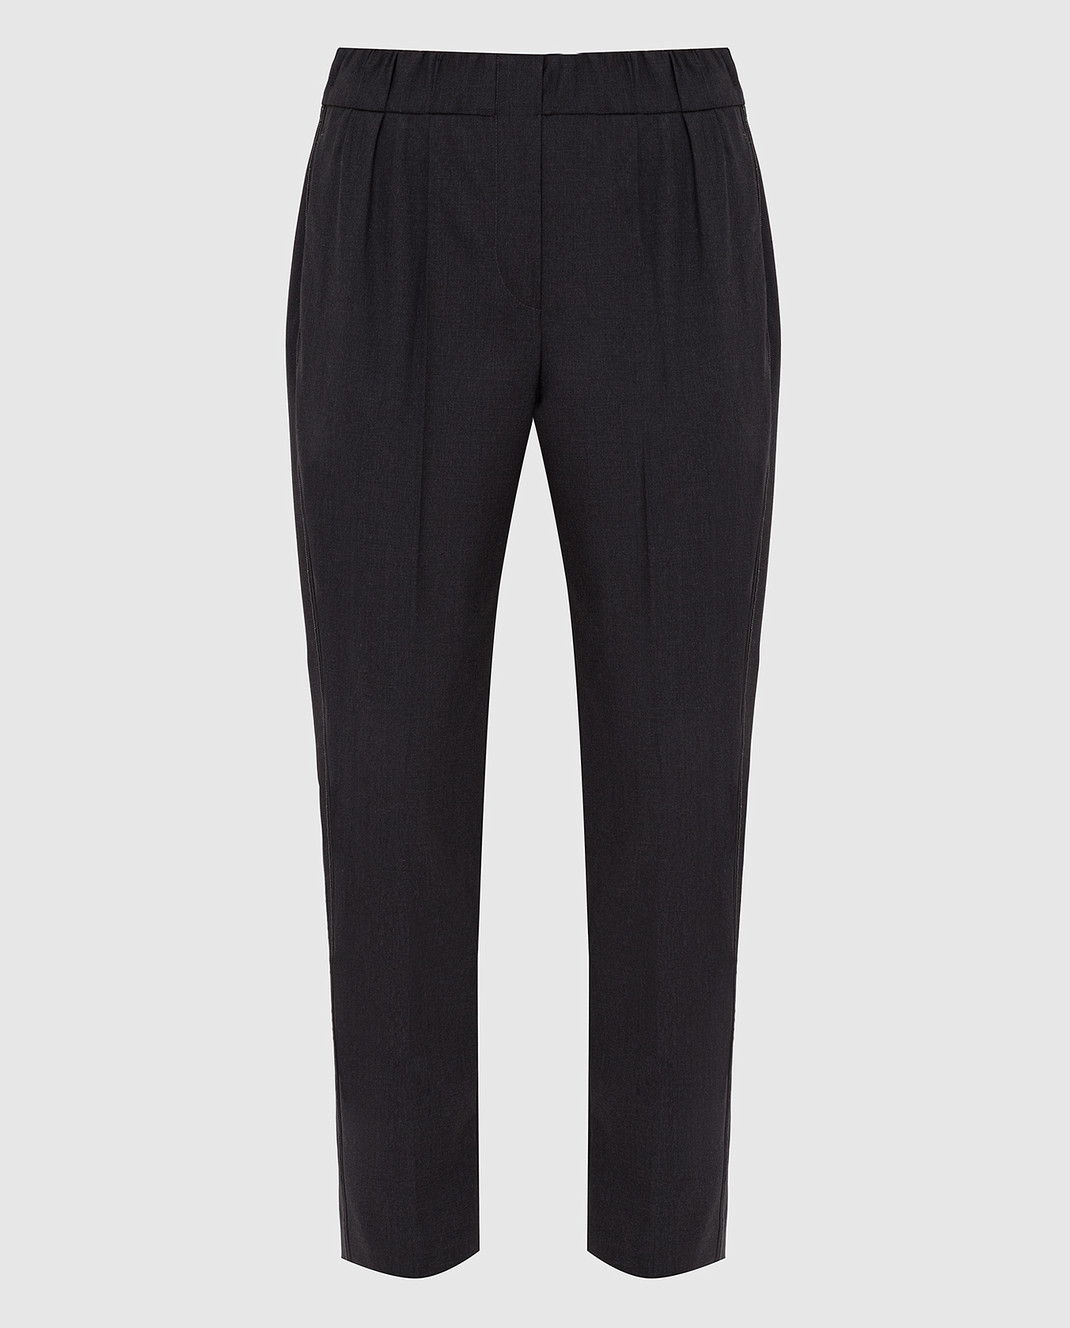 Brunello Cucinelli Темно-серые брюки из шерсти M0W07P6818